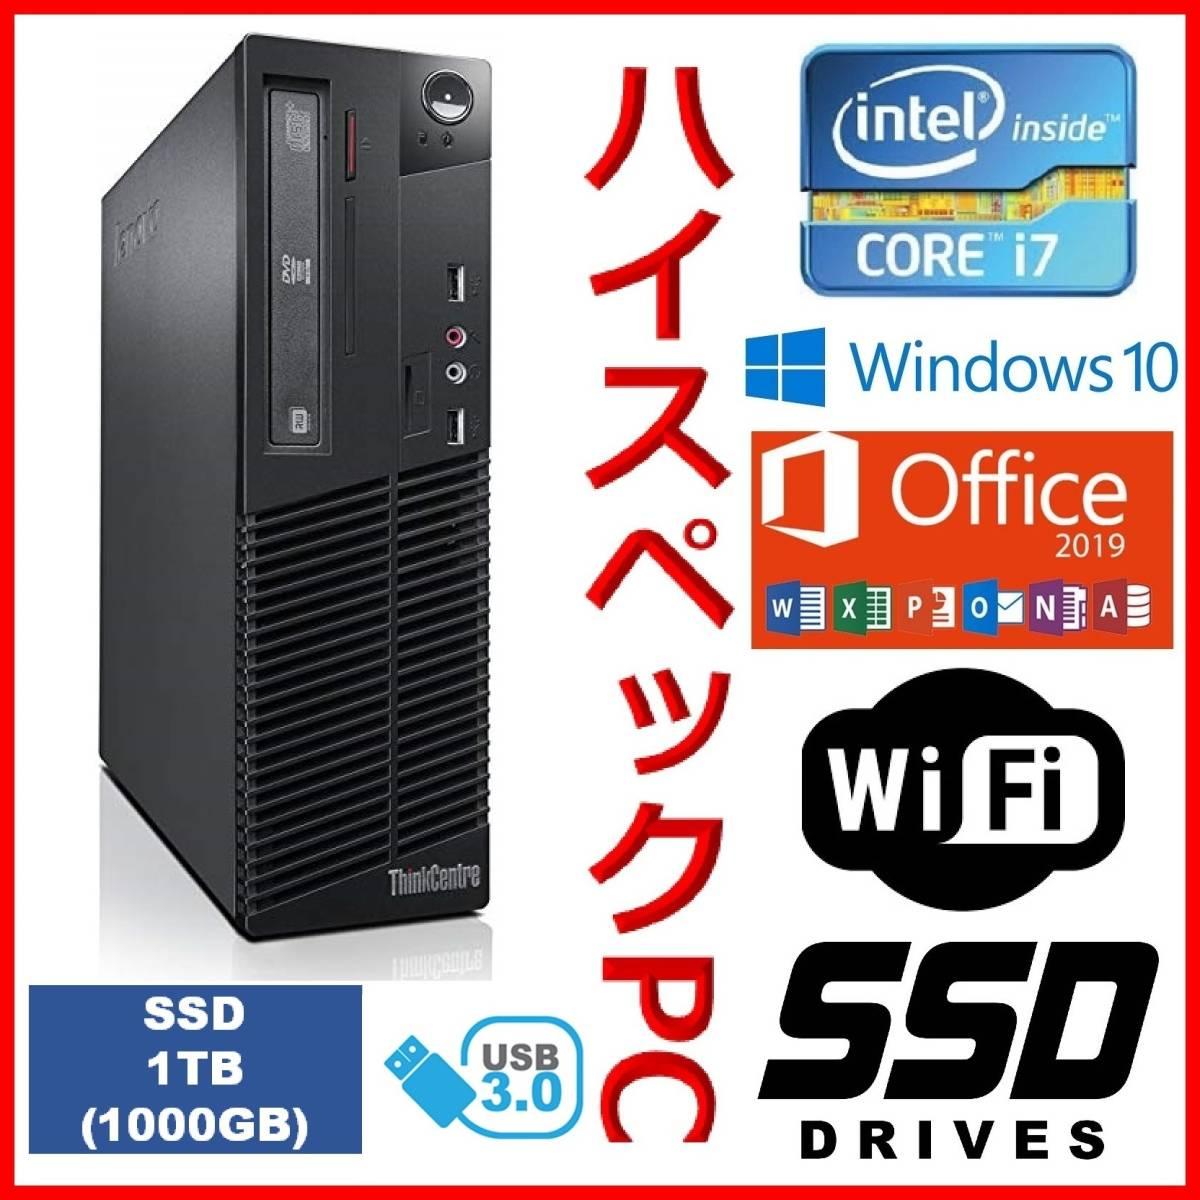 ●究極小型PC●新SSD1TB(1000GB)●i7-4790(4.0Gx8)●メモリ16GB●無線LAN(Wi-Fi)●USB3.0